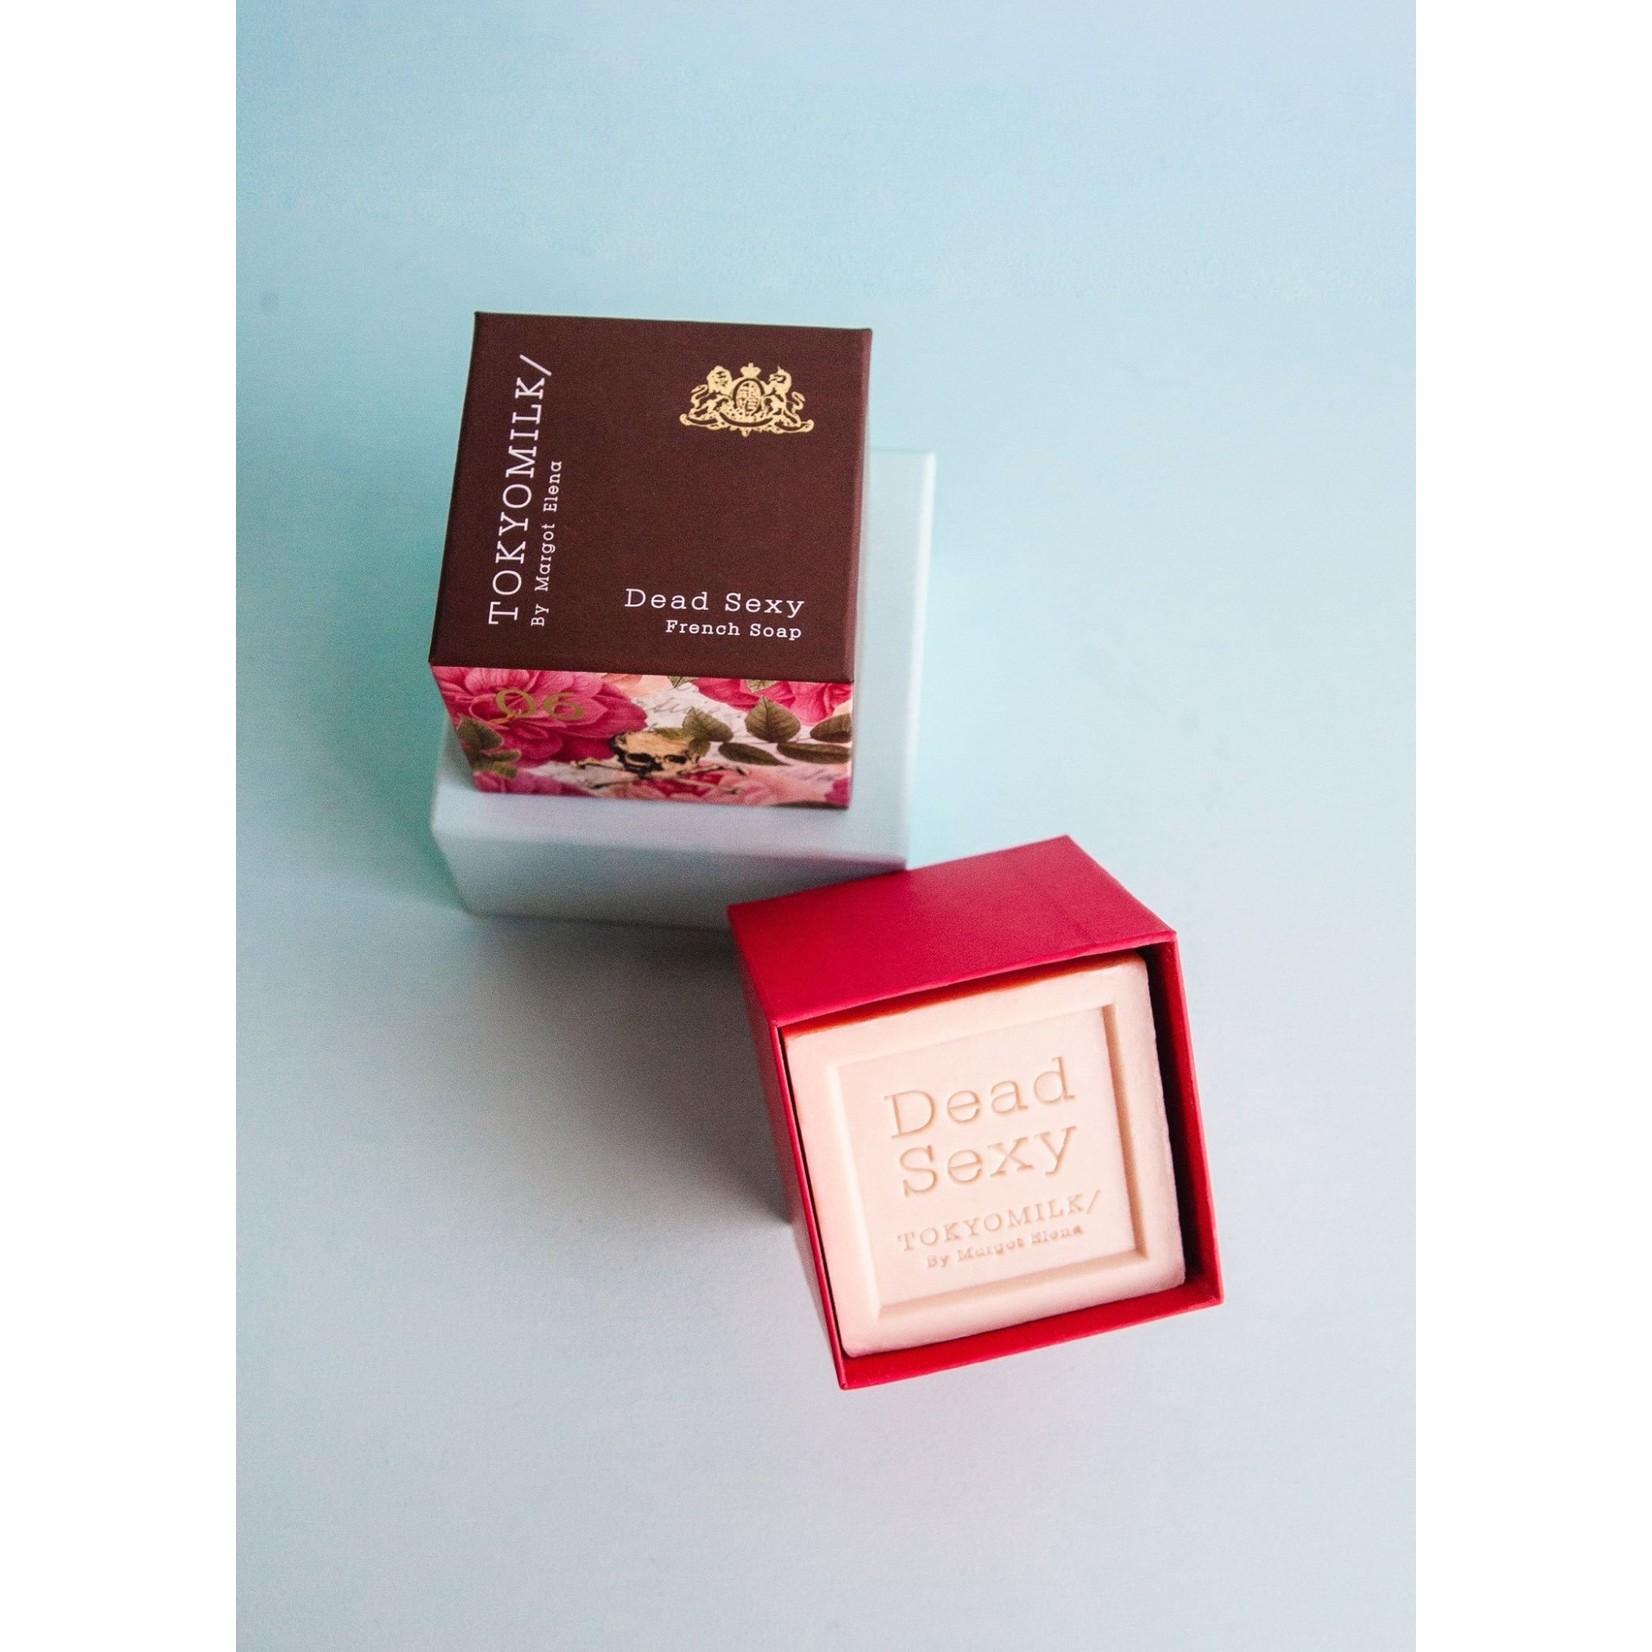 Tokyomilk Dead Sexy Embossed Soap in a Box